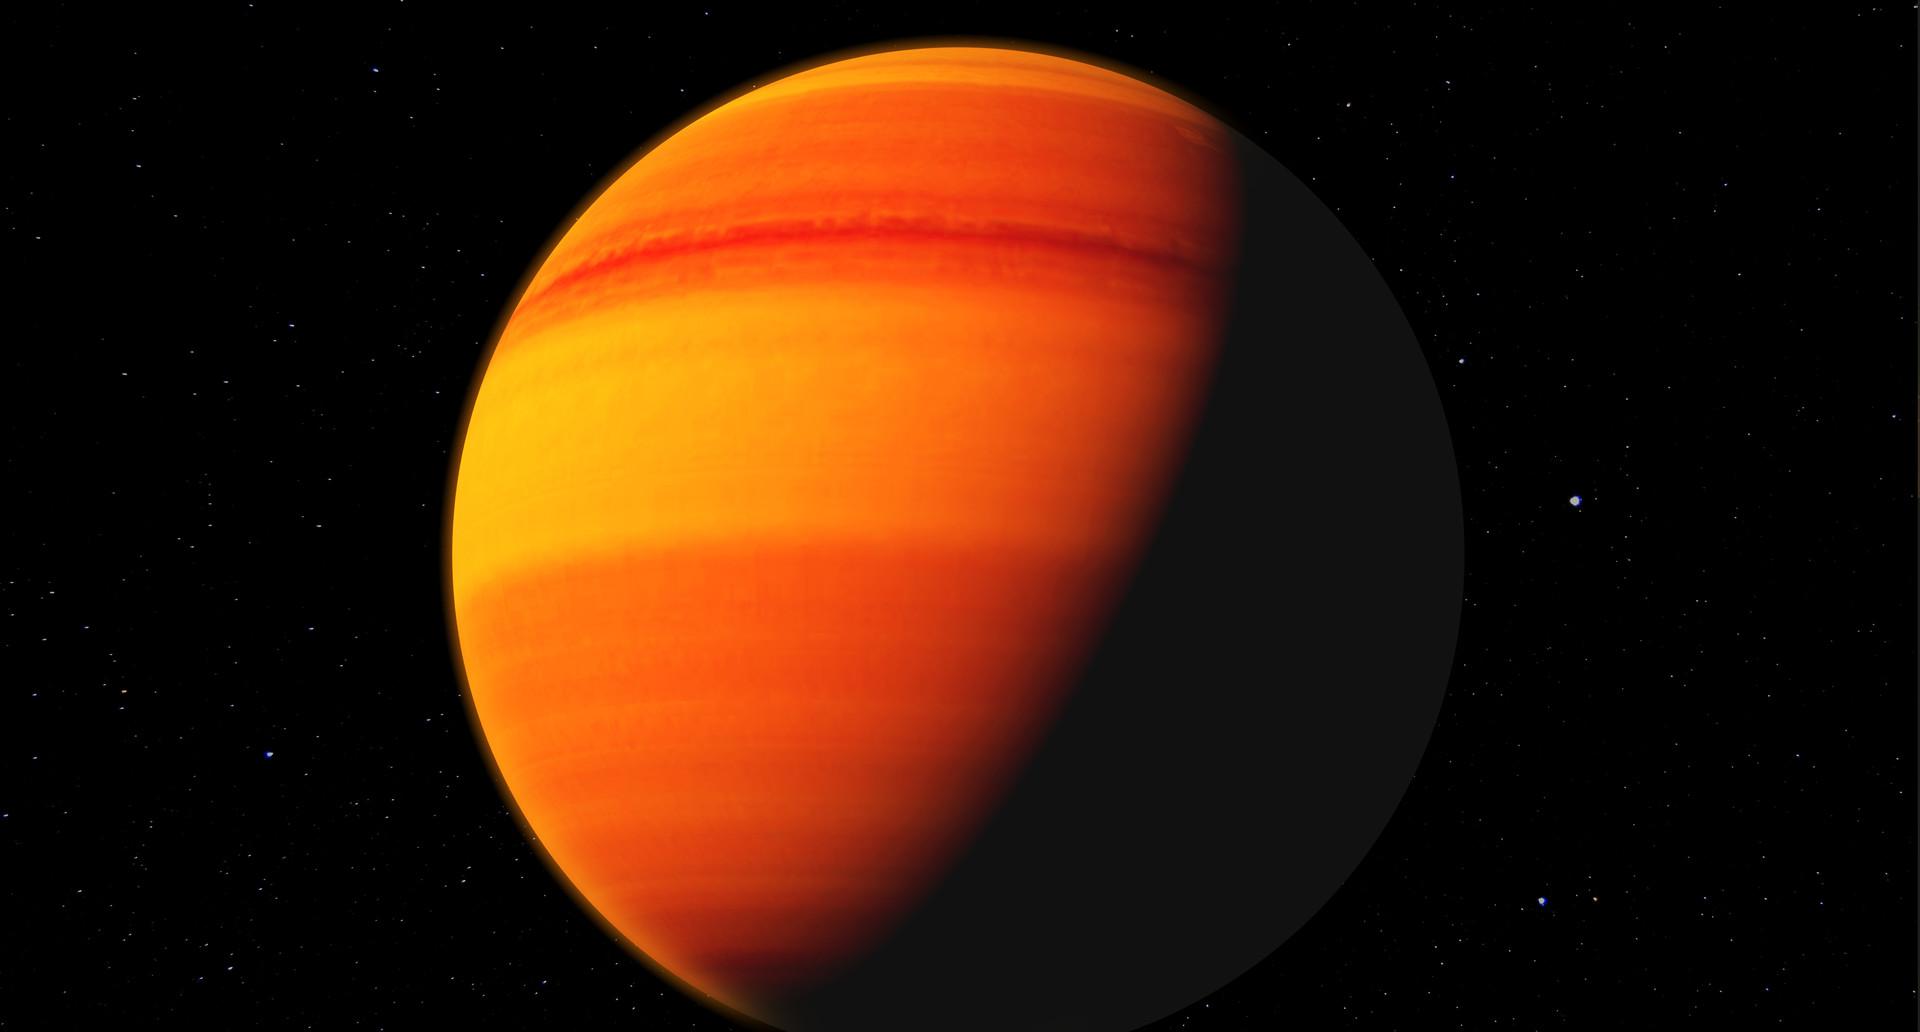 Kevin moran gasplanet01 v2